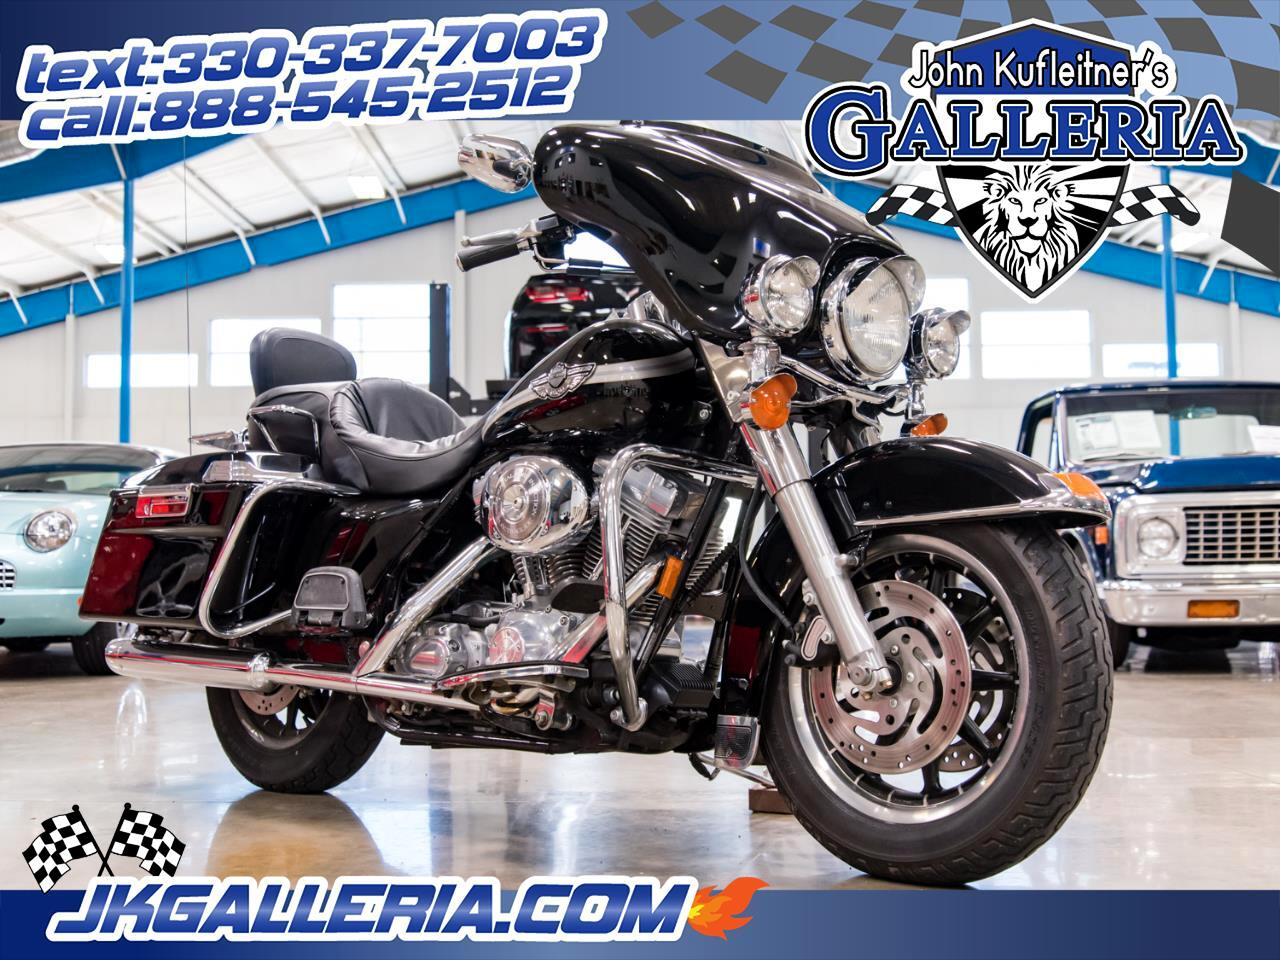 2003 Harley-Davidson Electra Glide Standard 100th Anniversary